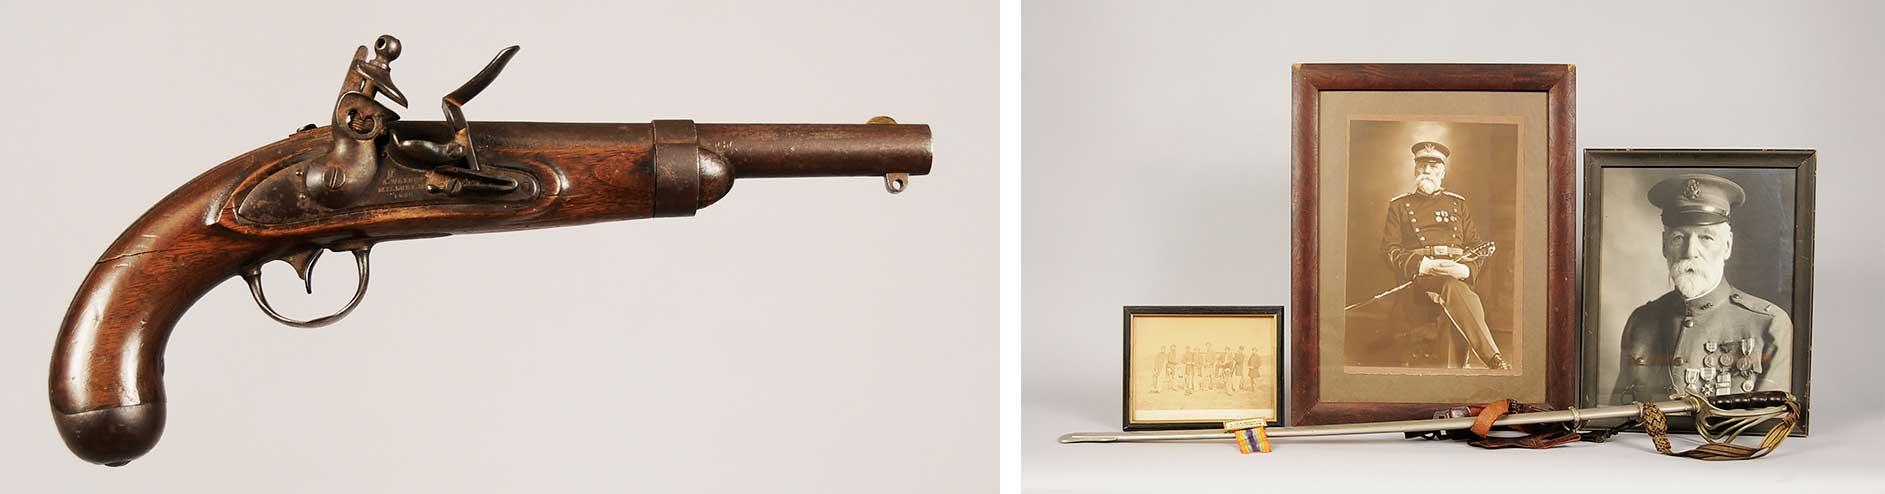 A. Waters Model 1836 Flintlock | Civil War Sword Owned by Lieut. W.N. Williams